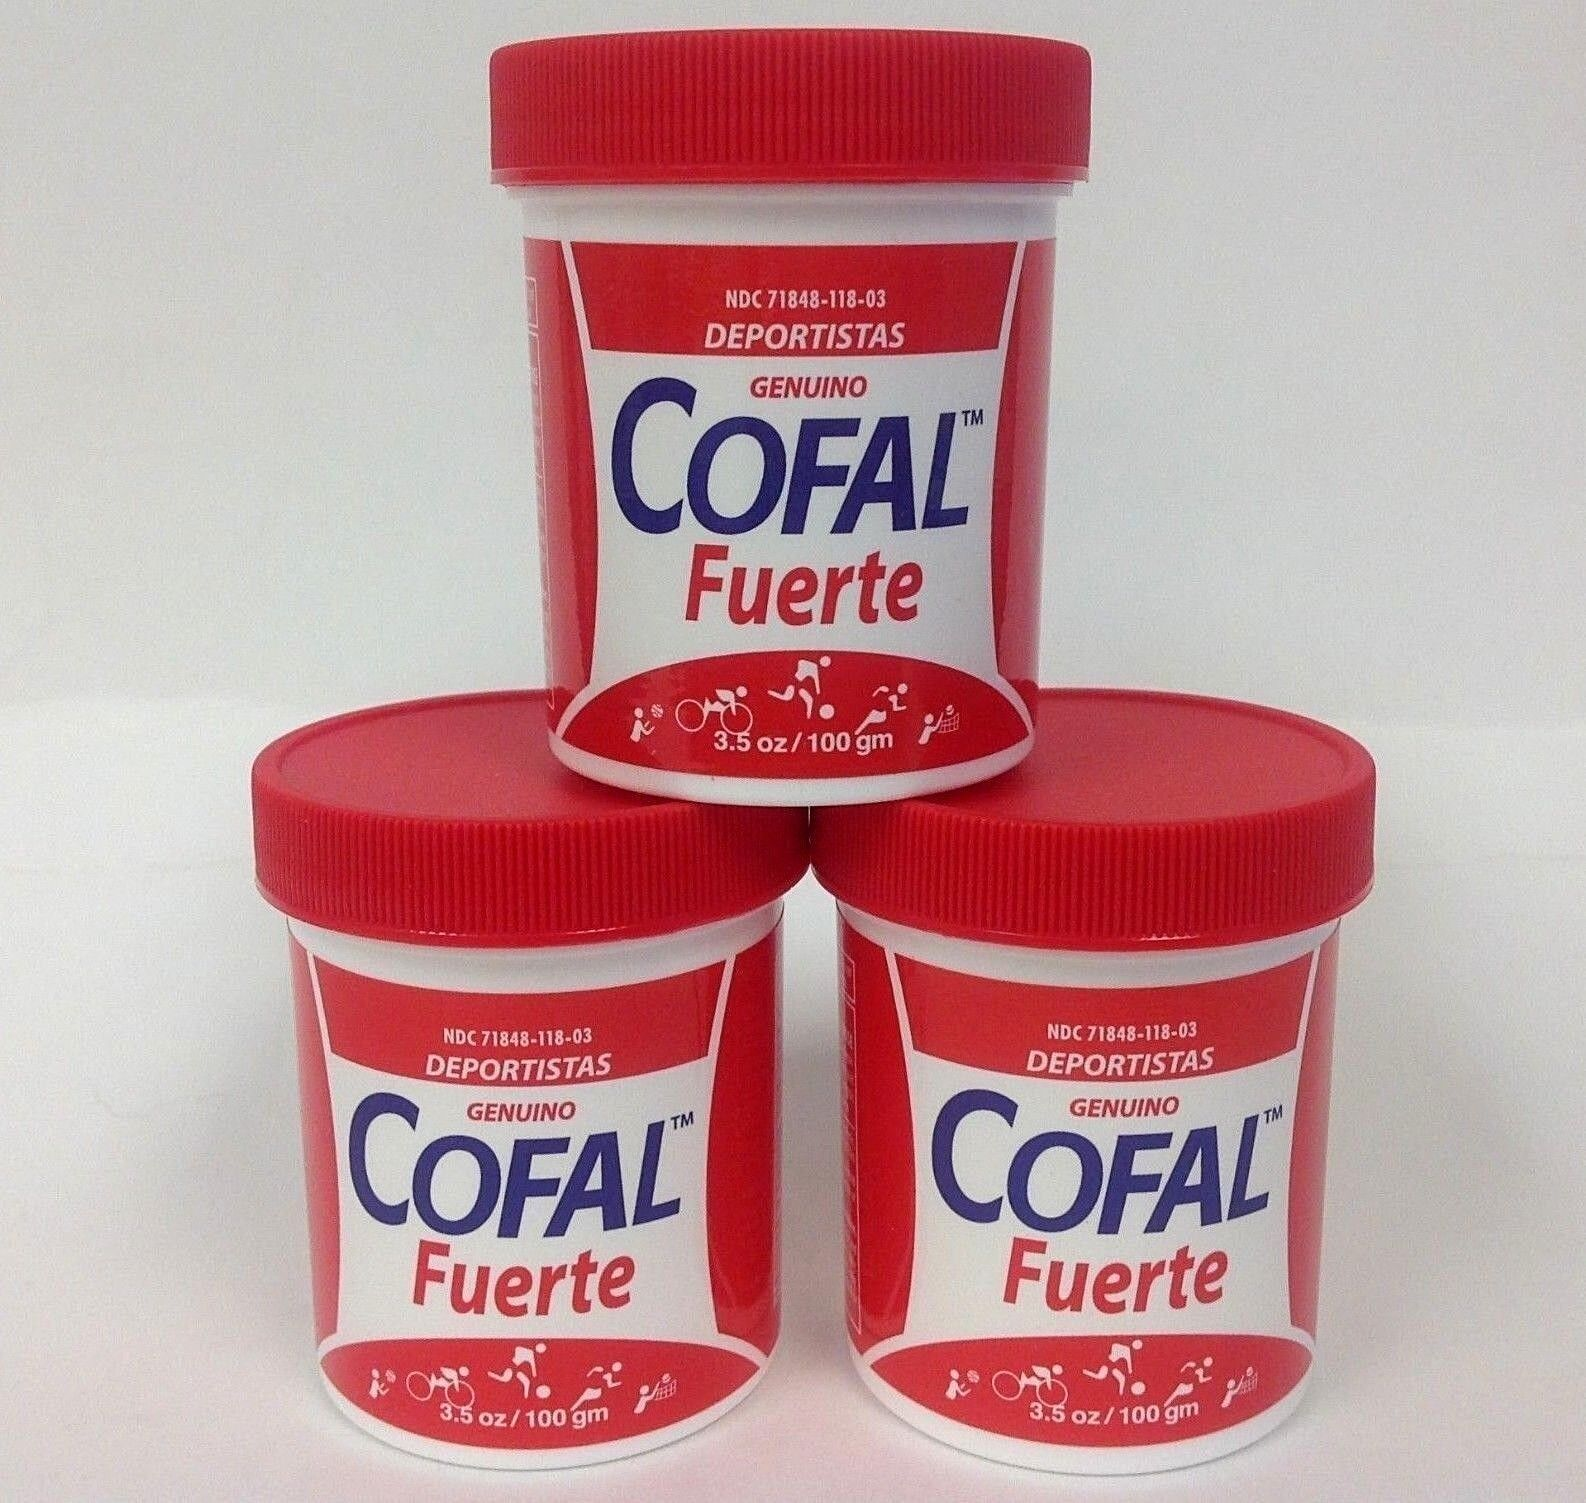 3 COFAL FUERTE ROJO 3.5oz GRANDE - FOR MUSCULAR PAIN, ARTHRITIS, BACK PAIN